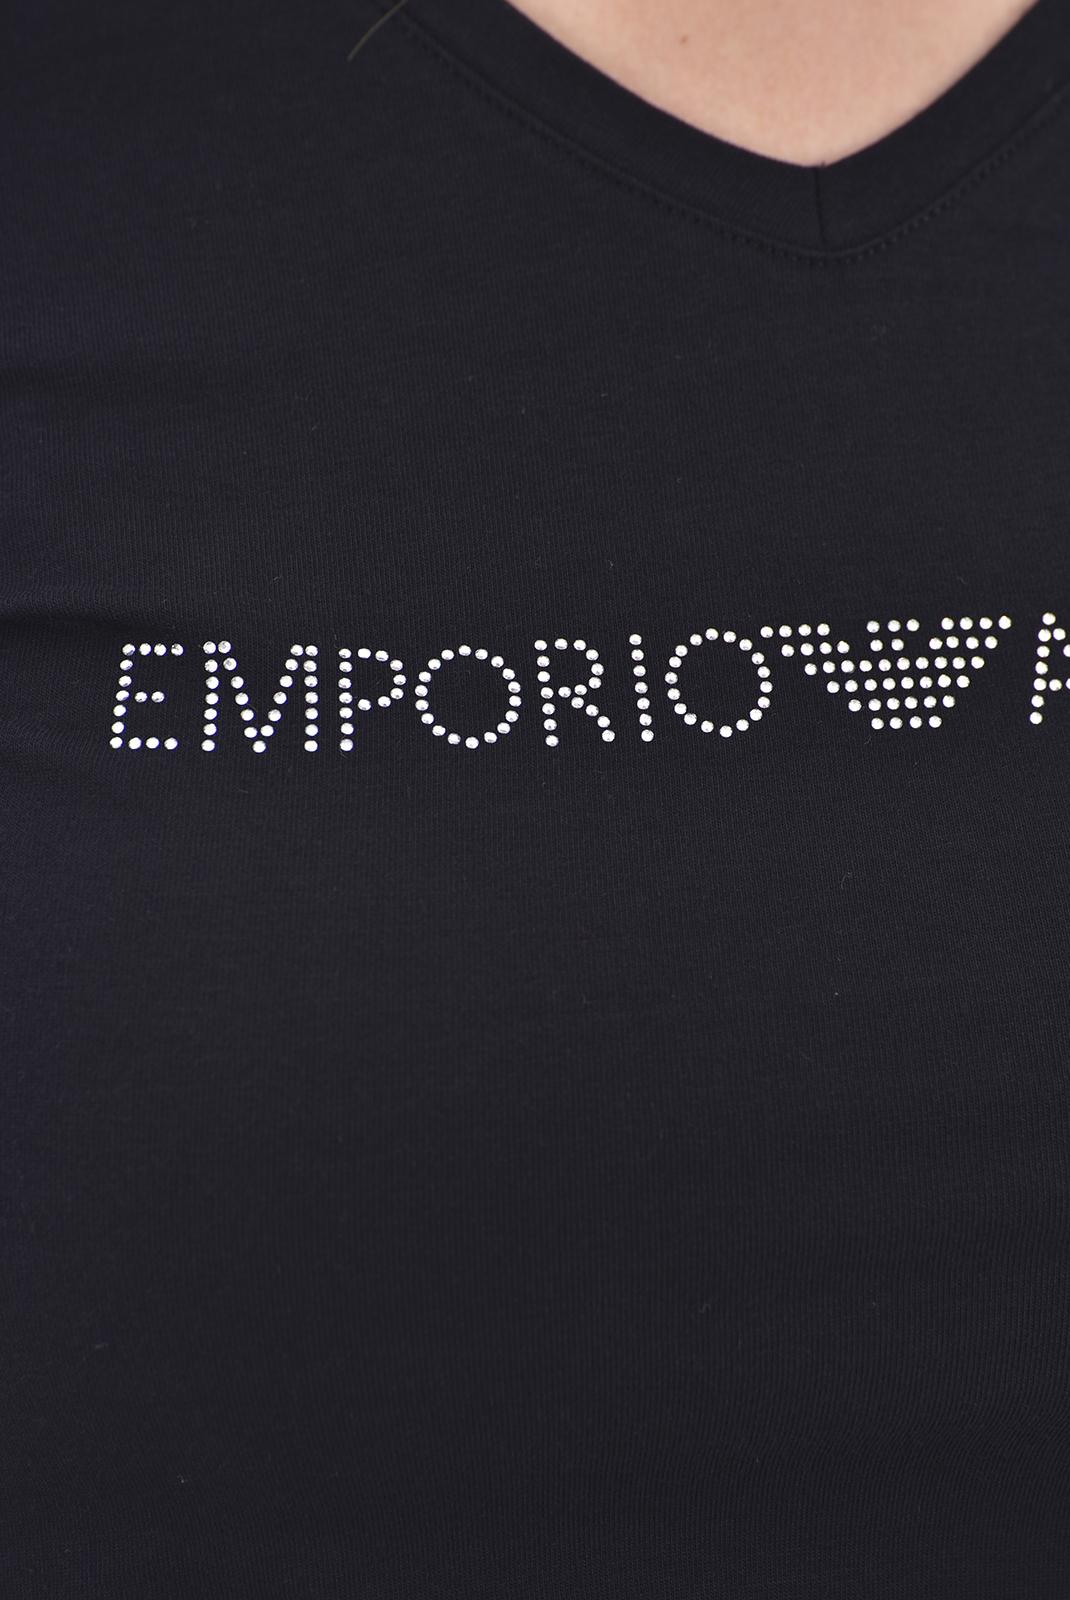 Tee shirt  Emporio armani 163321 0A263 020 BLACK